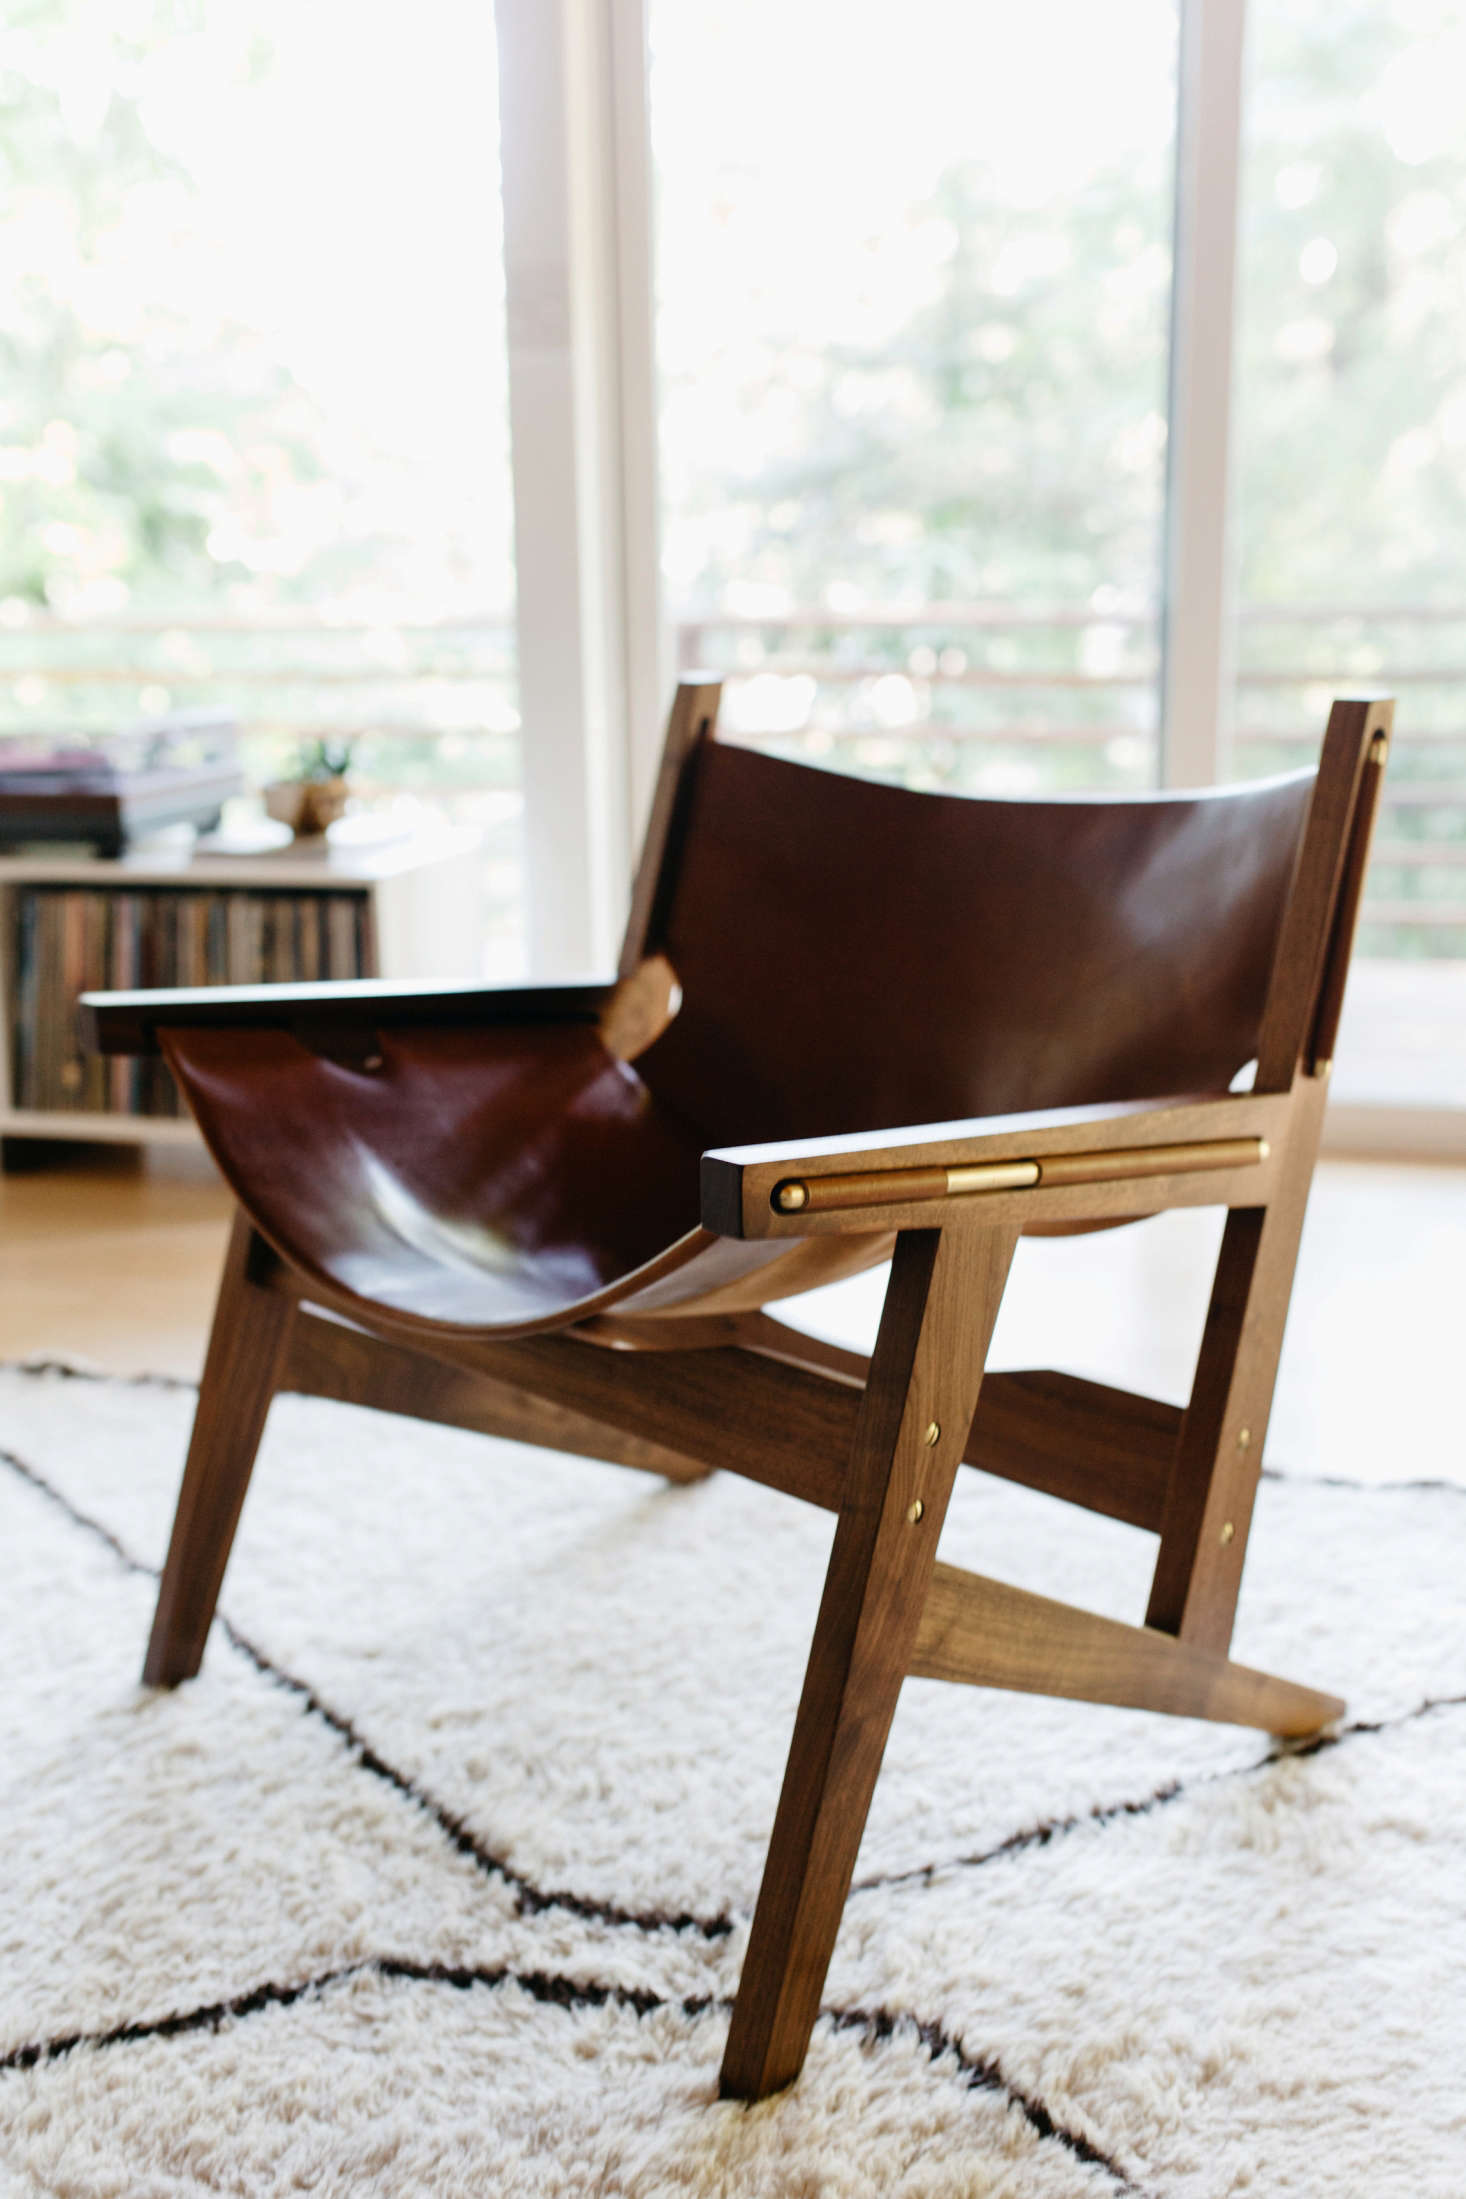 APeninsula Chair by Portland furniture company Phloem Studio.